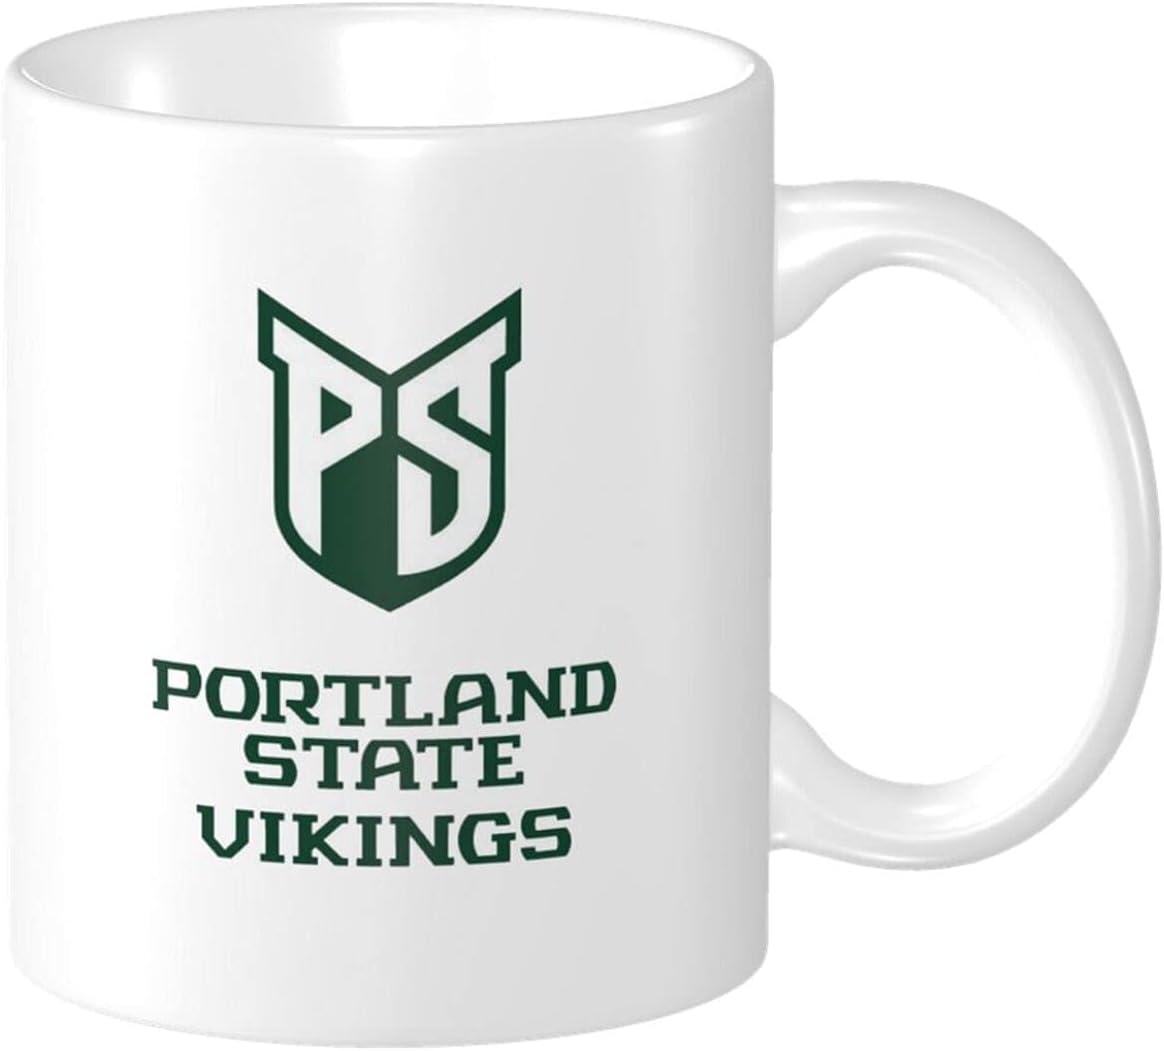 Psu Portland State Over item handling ☆ University Vikings Coffee Popular product Ceramic For Mugs Of